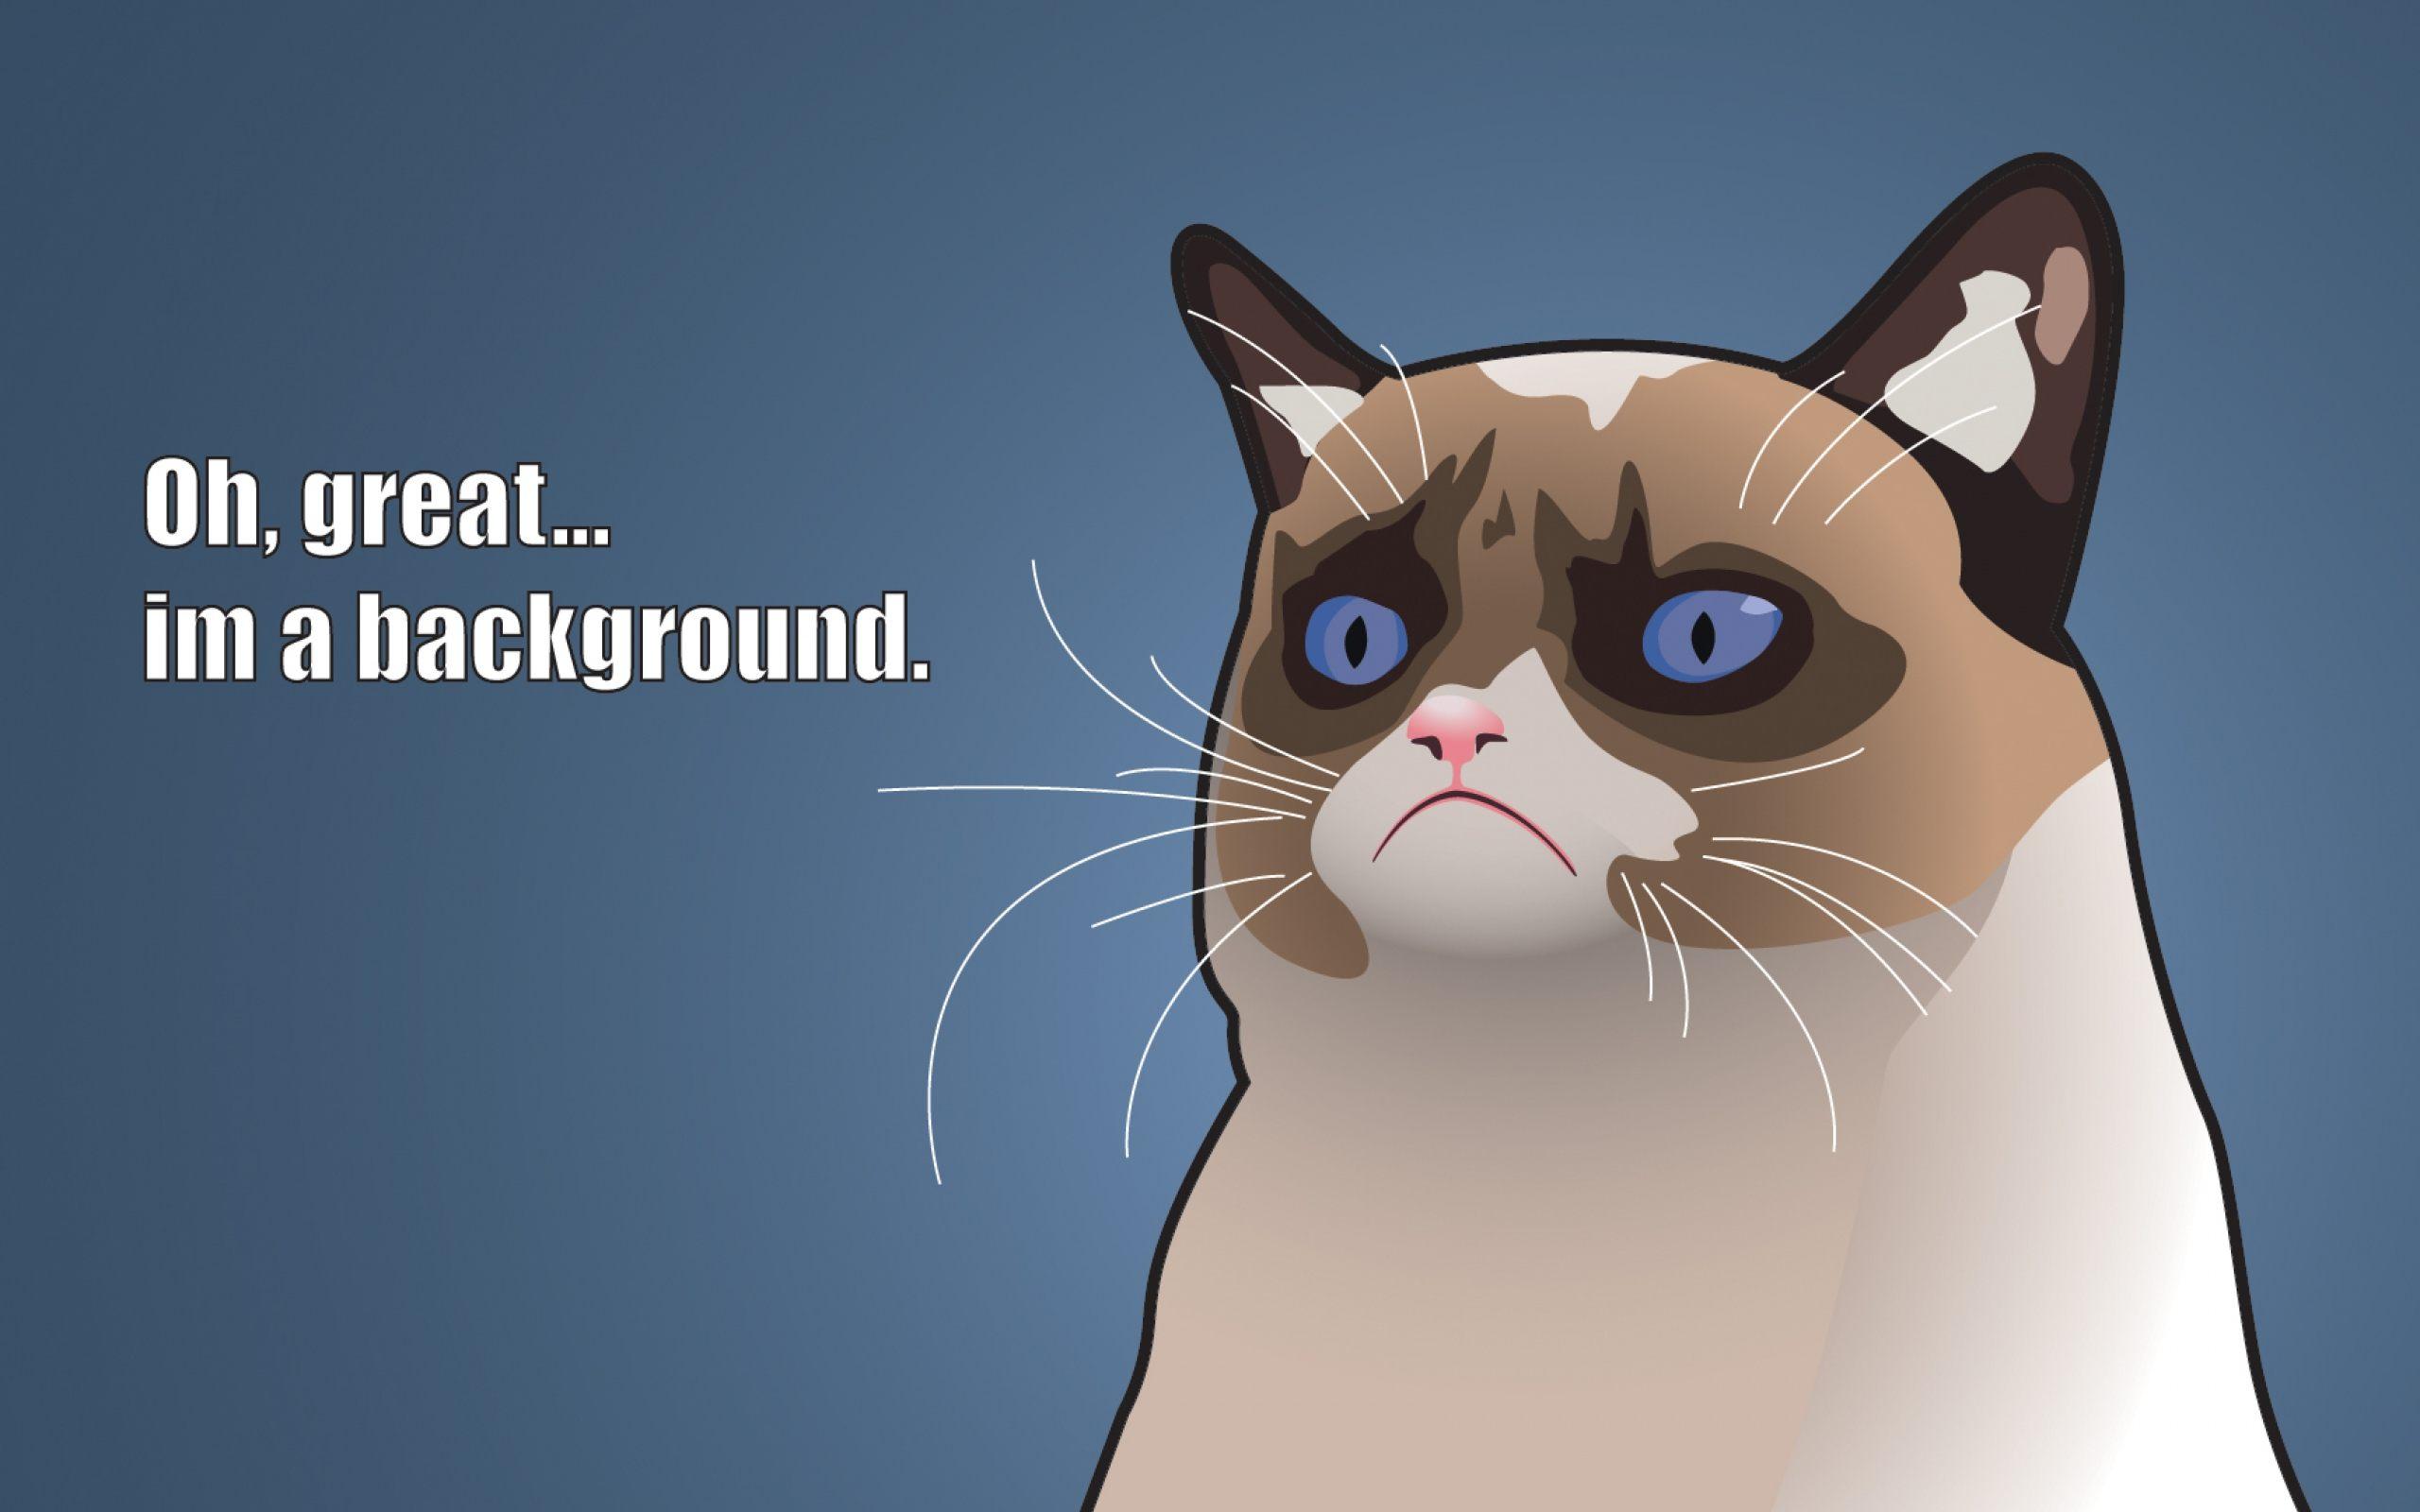 funny cat wallpaper - hd wallpapers